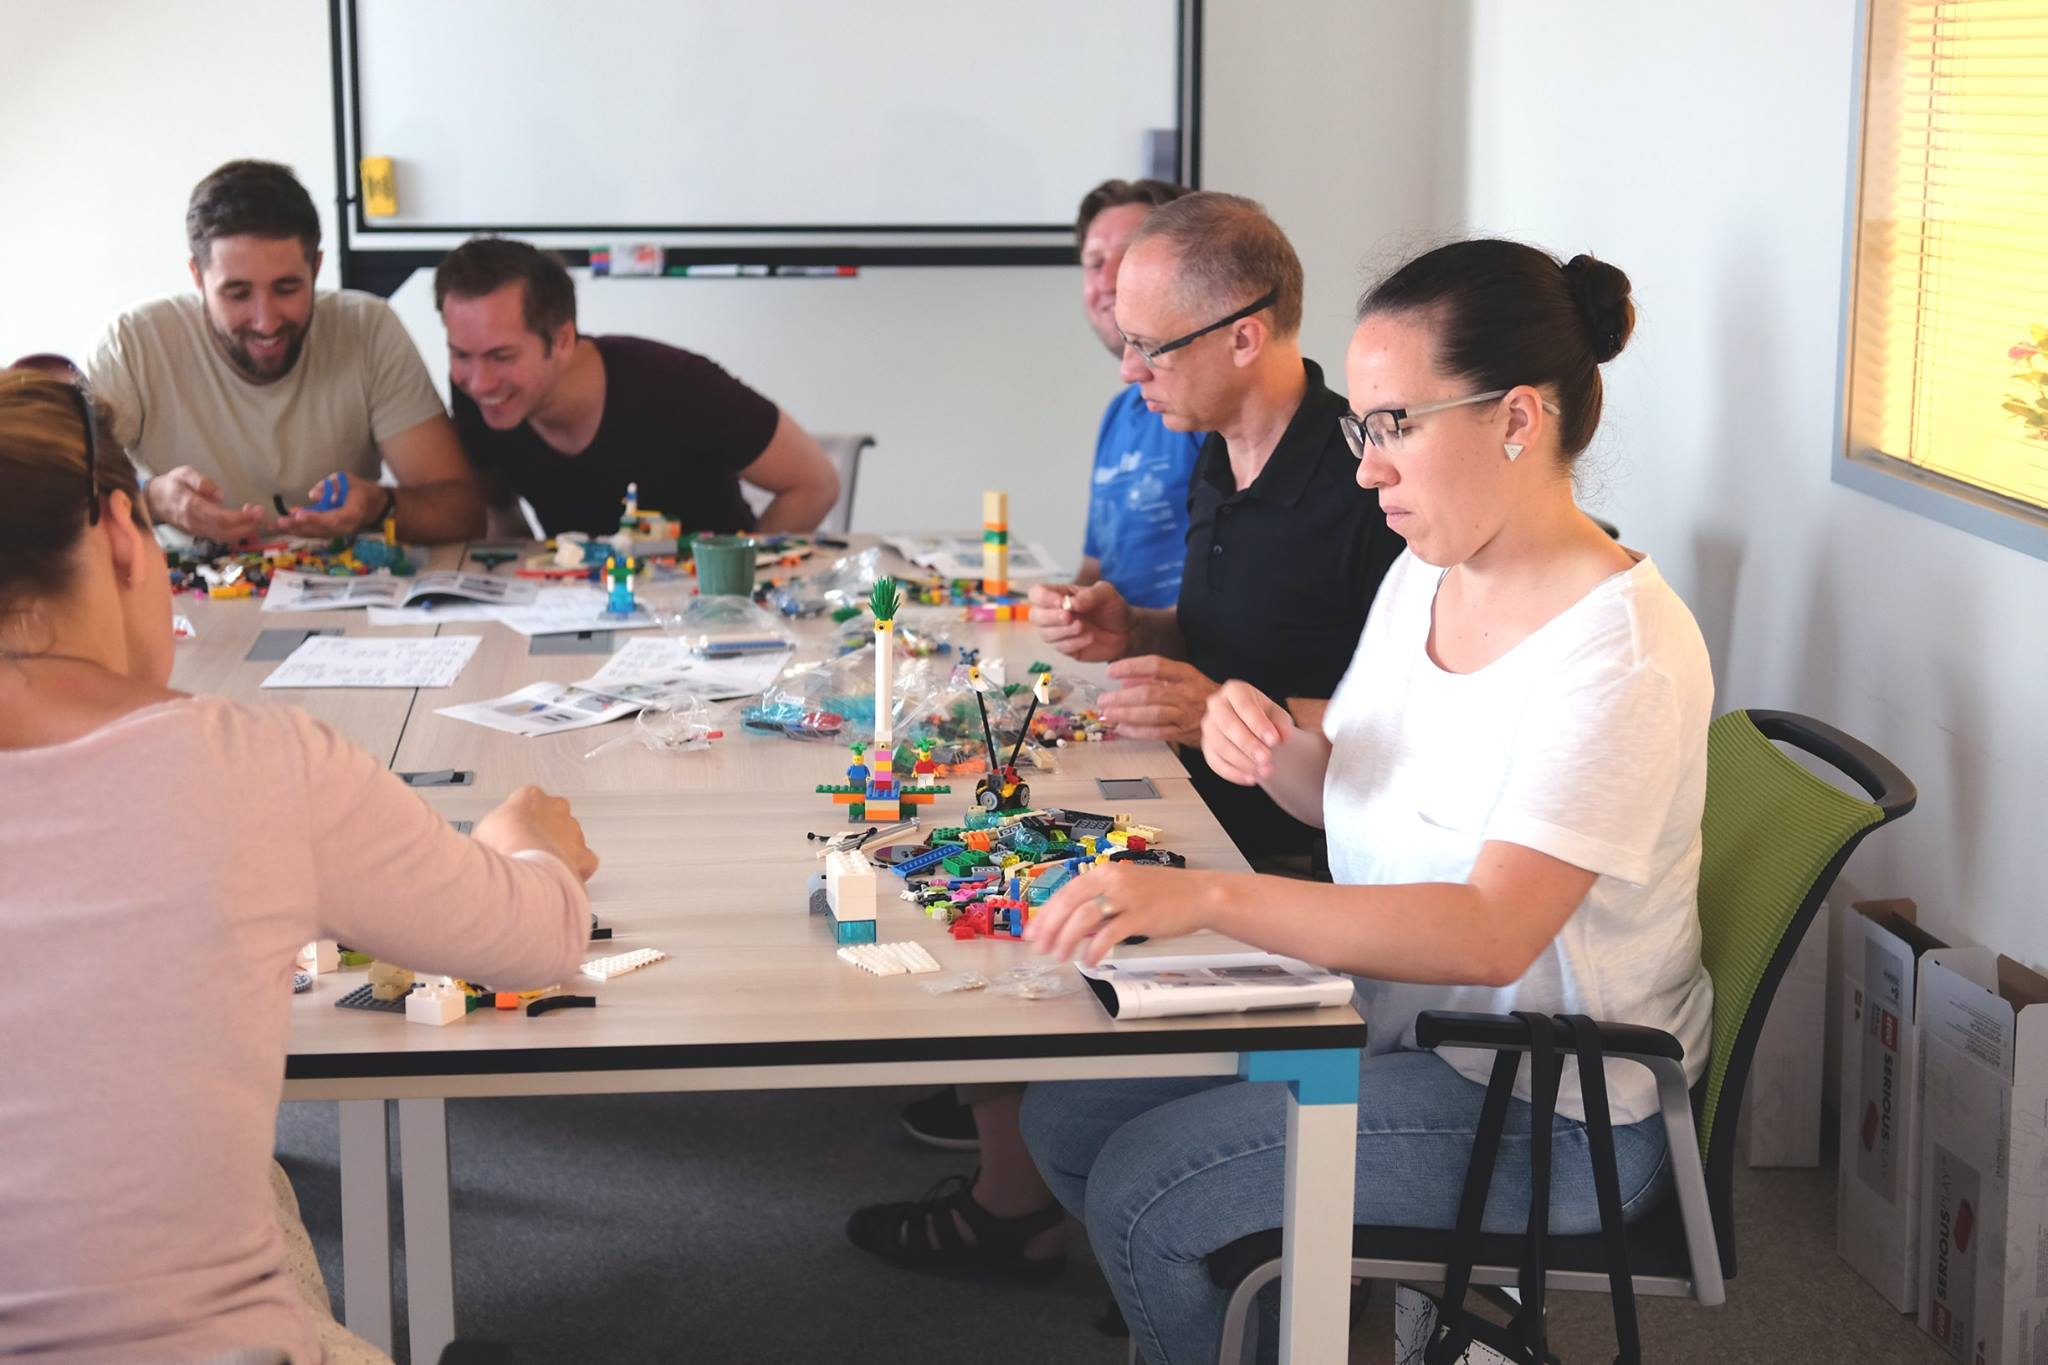 Lego serious play workshop at Ergománia